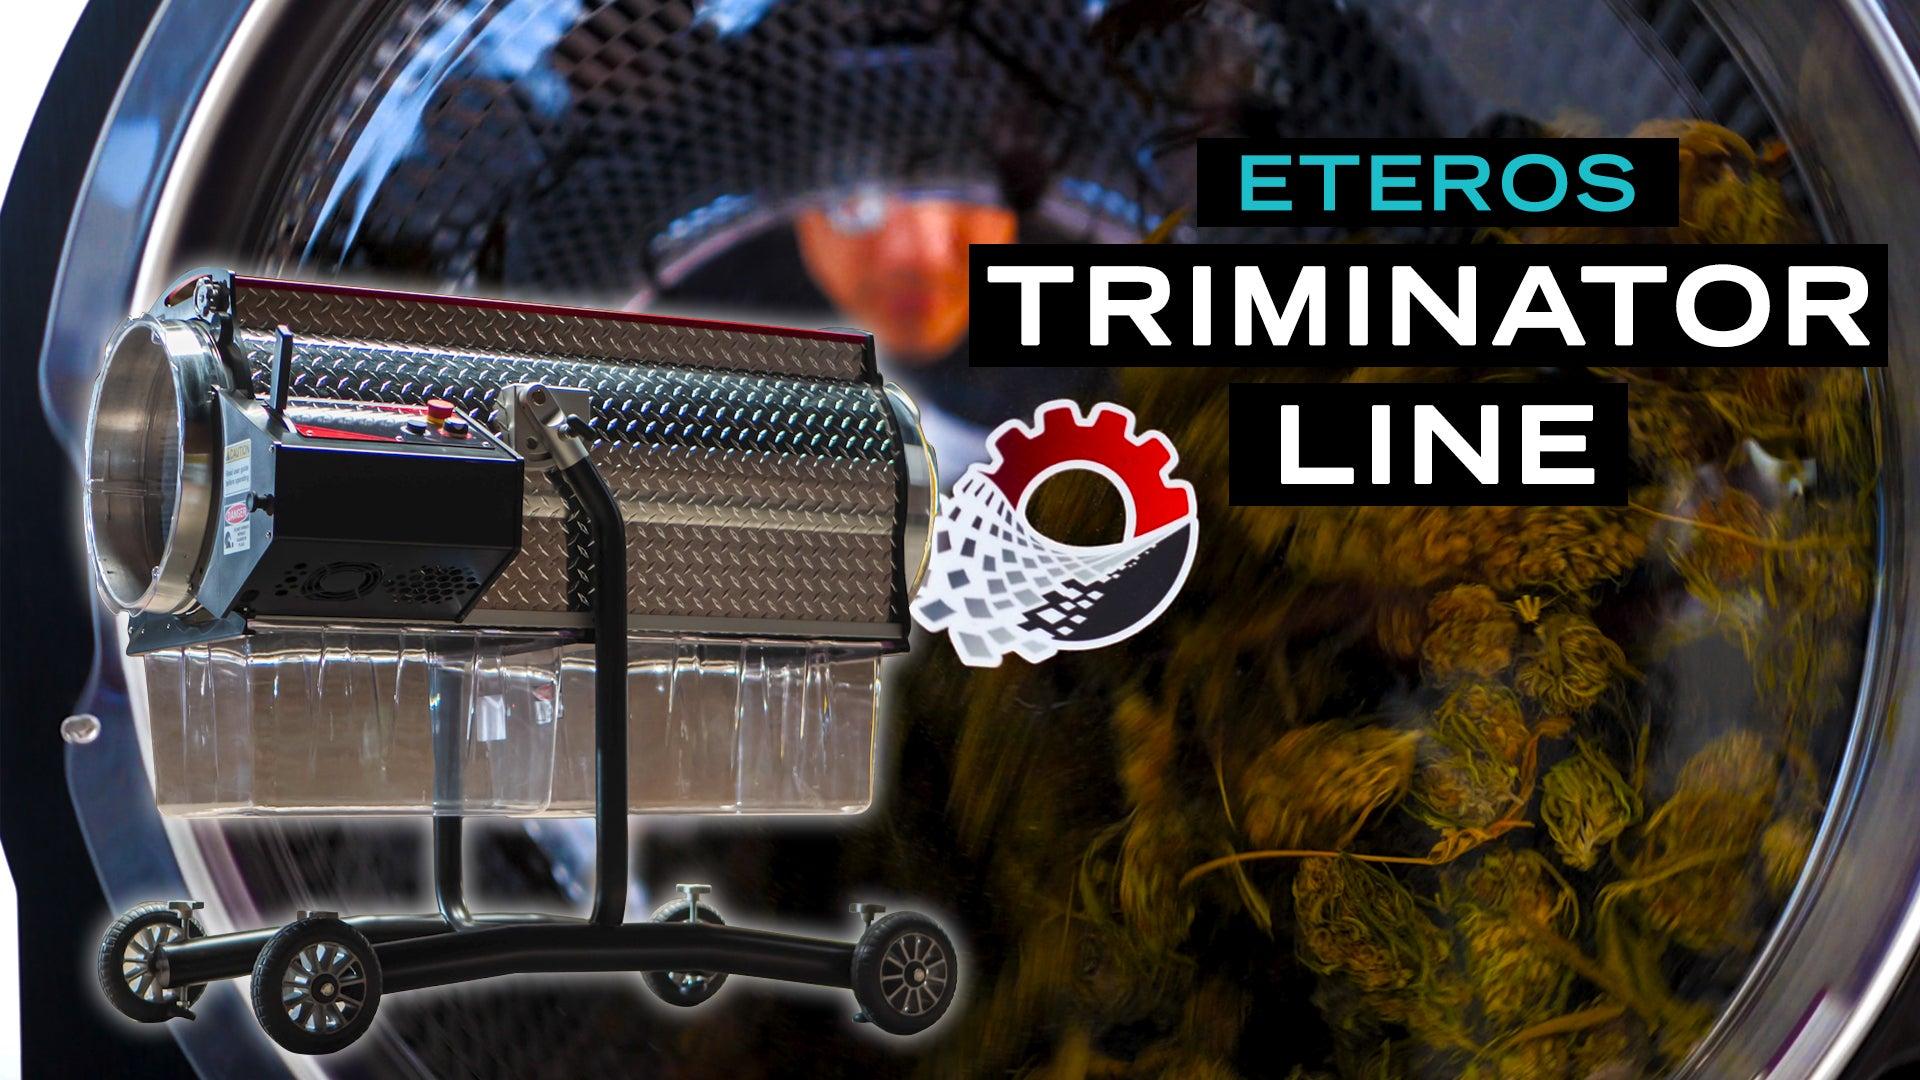 Eteros Triminator Harvesting Line